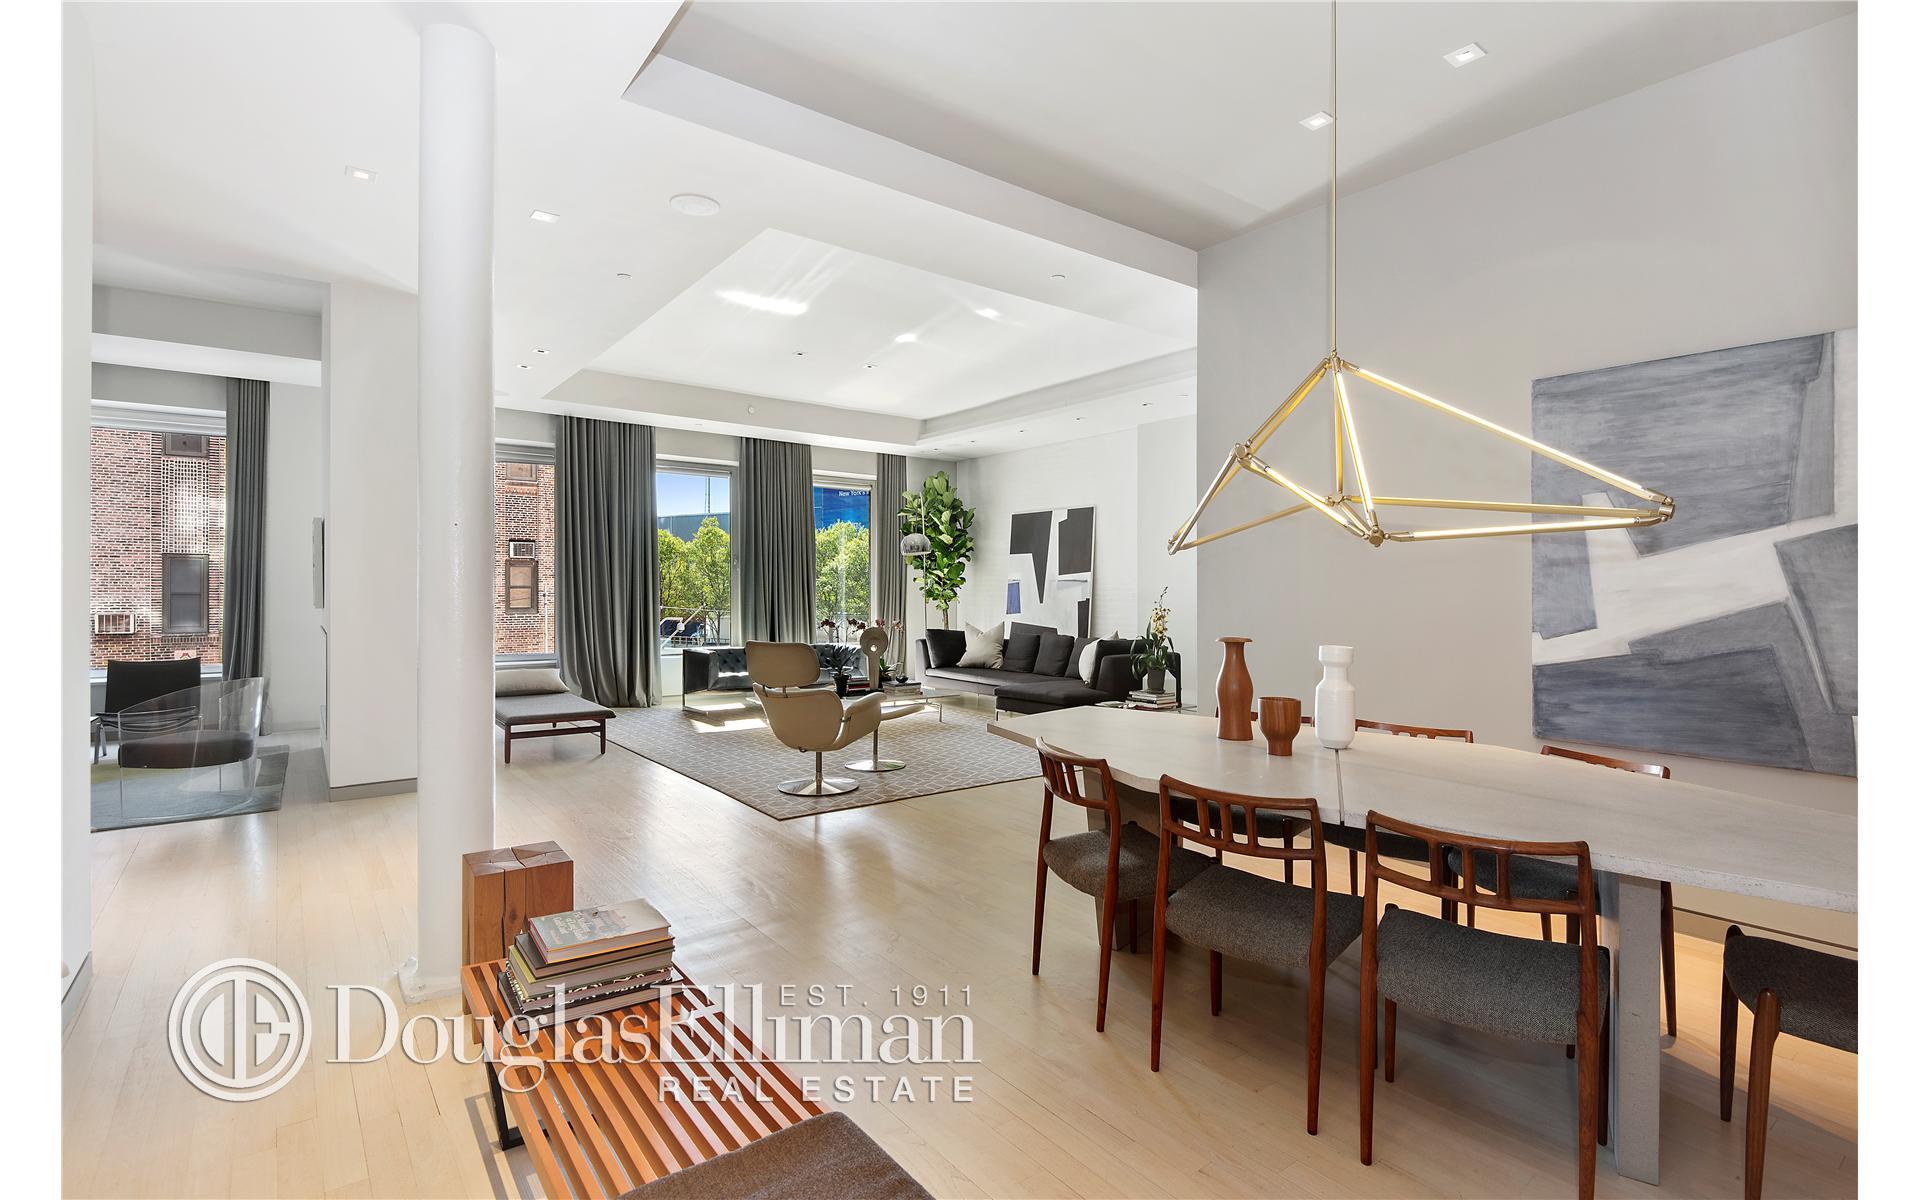 Condominium for Sale at 120 Eleventh Avenue New York, New York 10011 United States